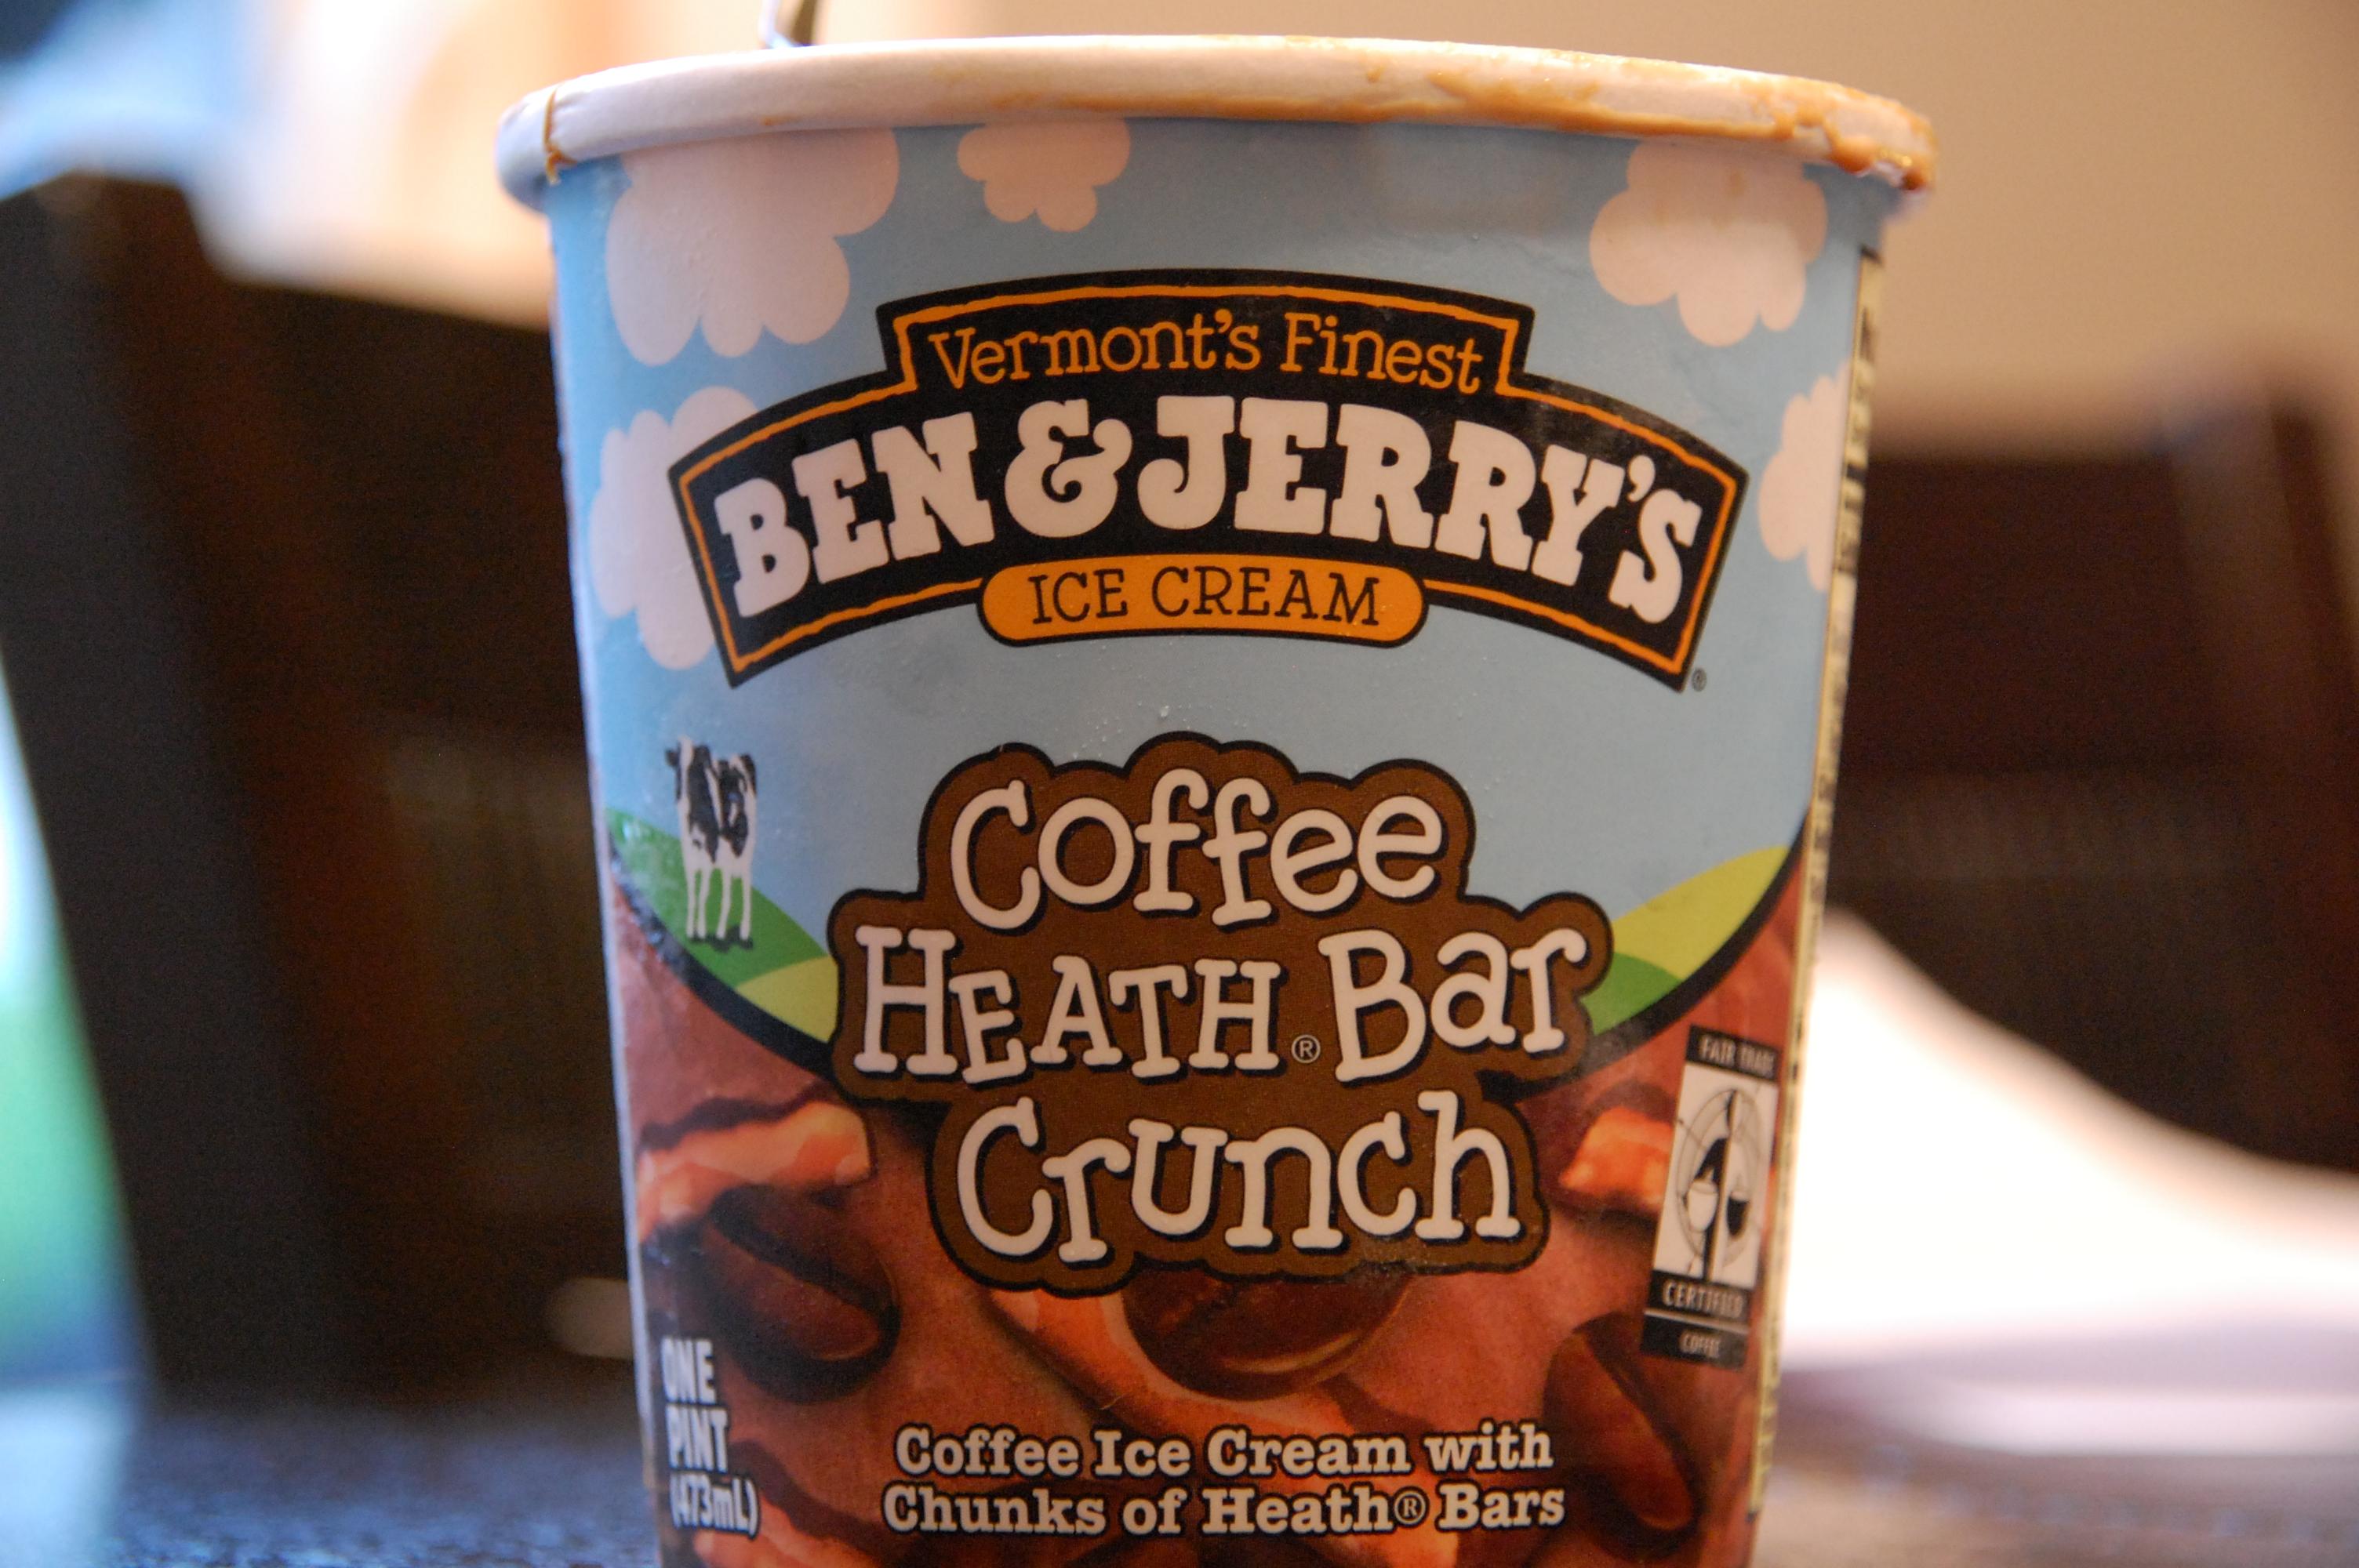 ... heath bar coffee heath bar ice cream coffee heath bar ice cream in